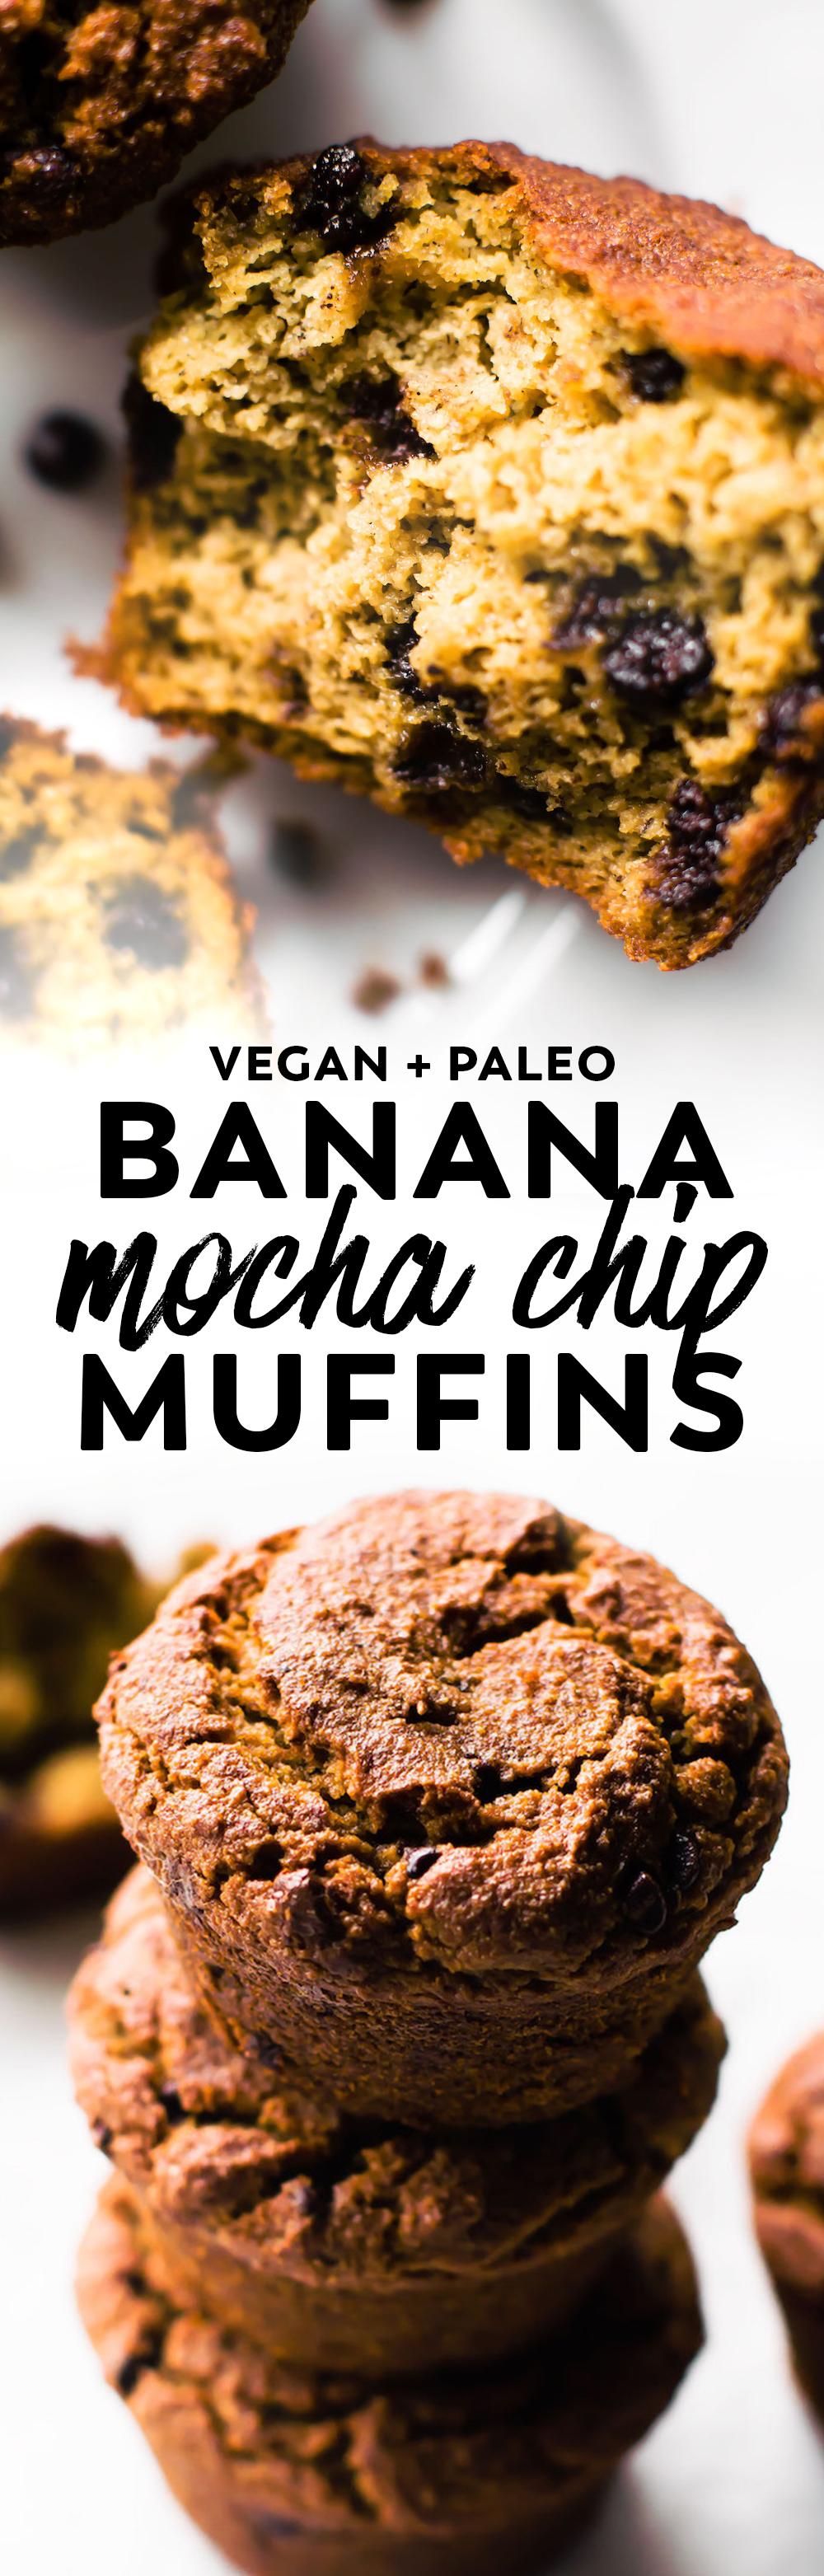 Banana Mocha Chip Muffins Recipe Food, Dessert recipes